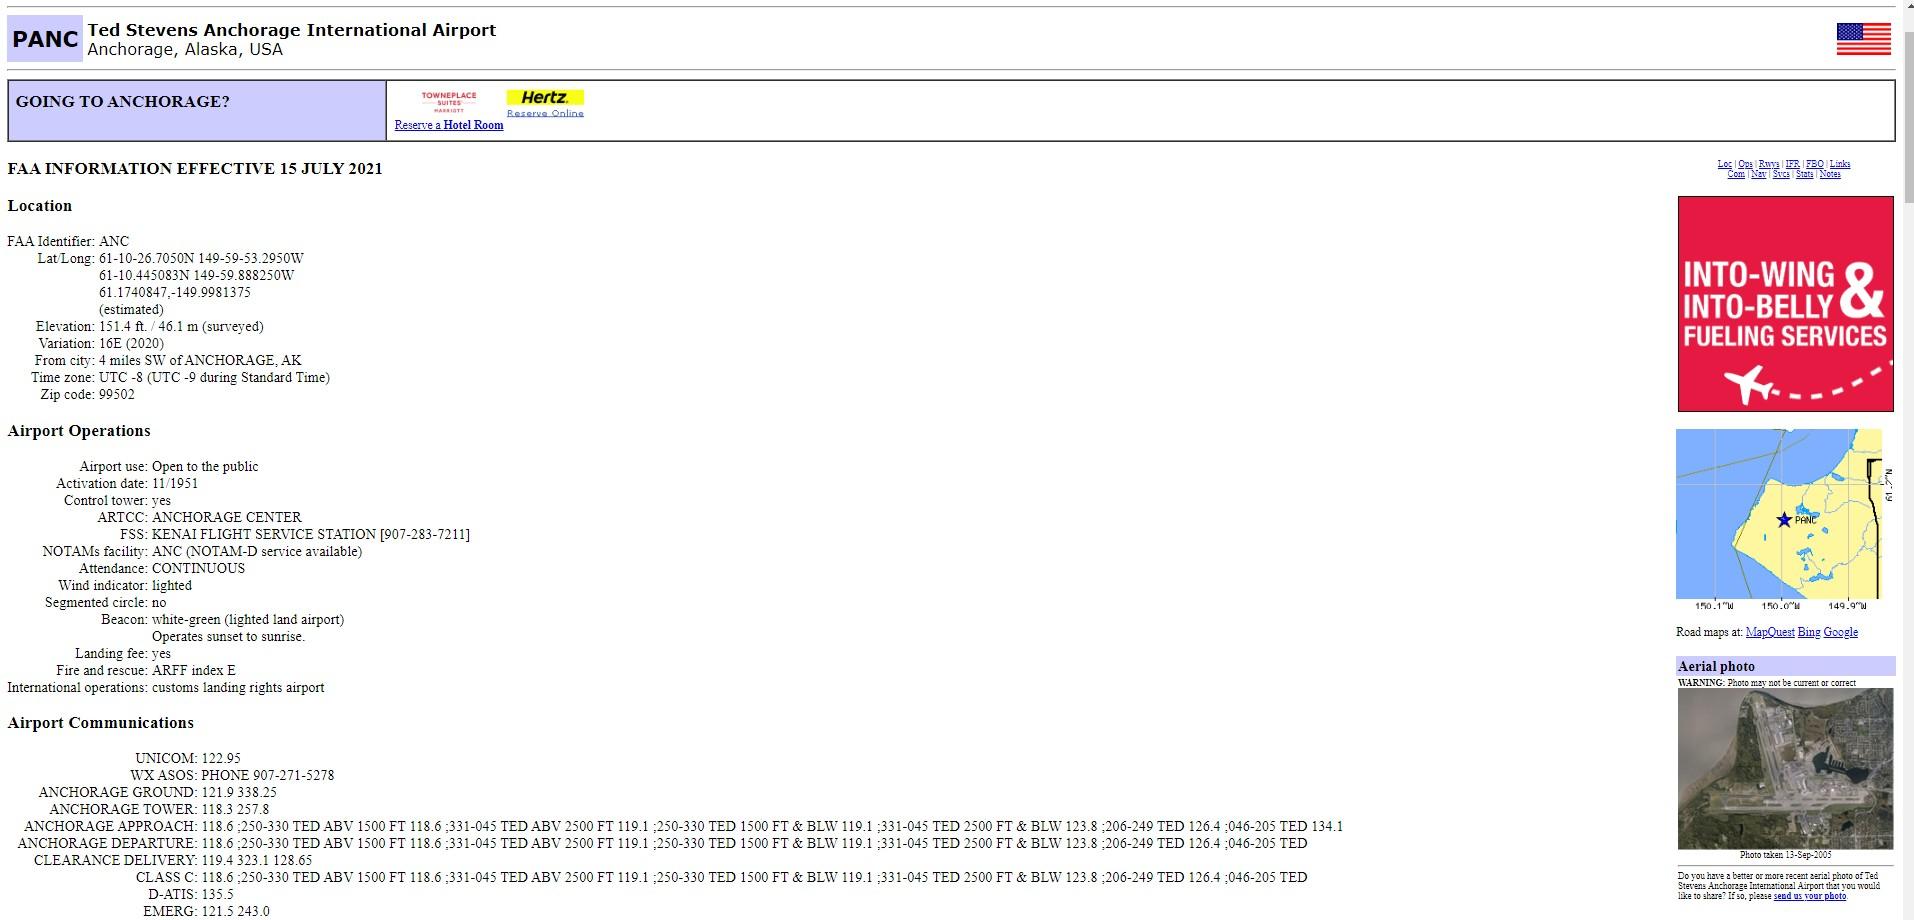 Airnav Panc Ted Stevens Anchorage International Airport Google Chrome 8 1 2021 6 28 22 Pm